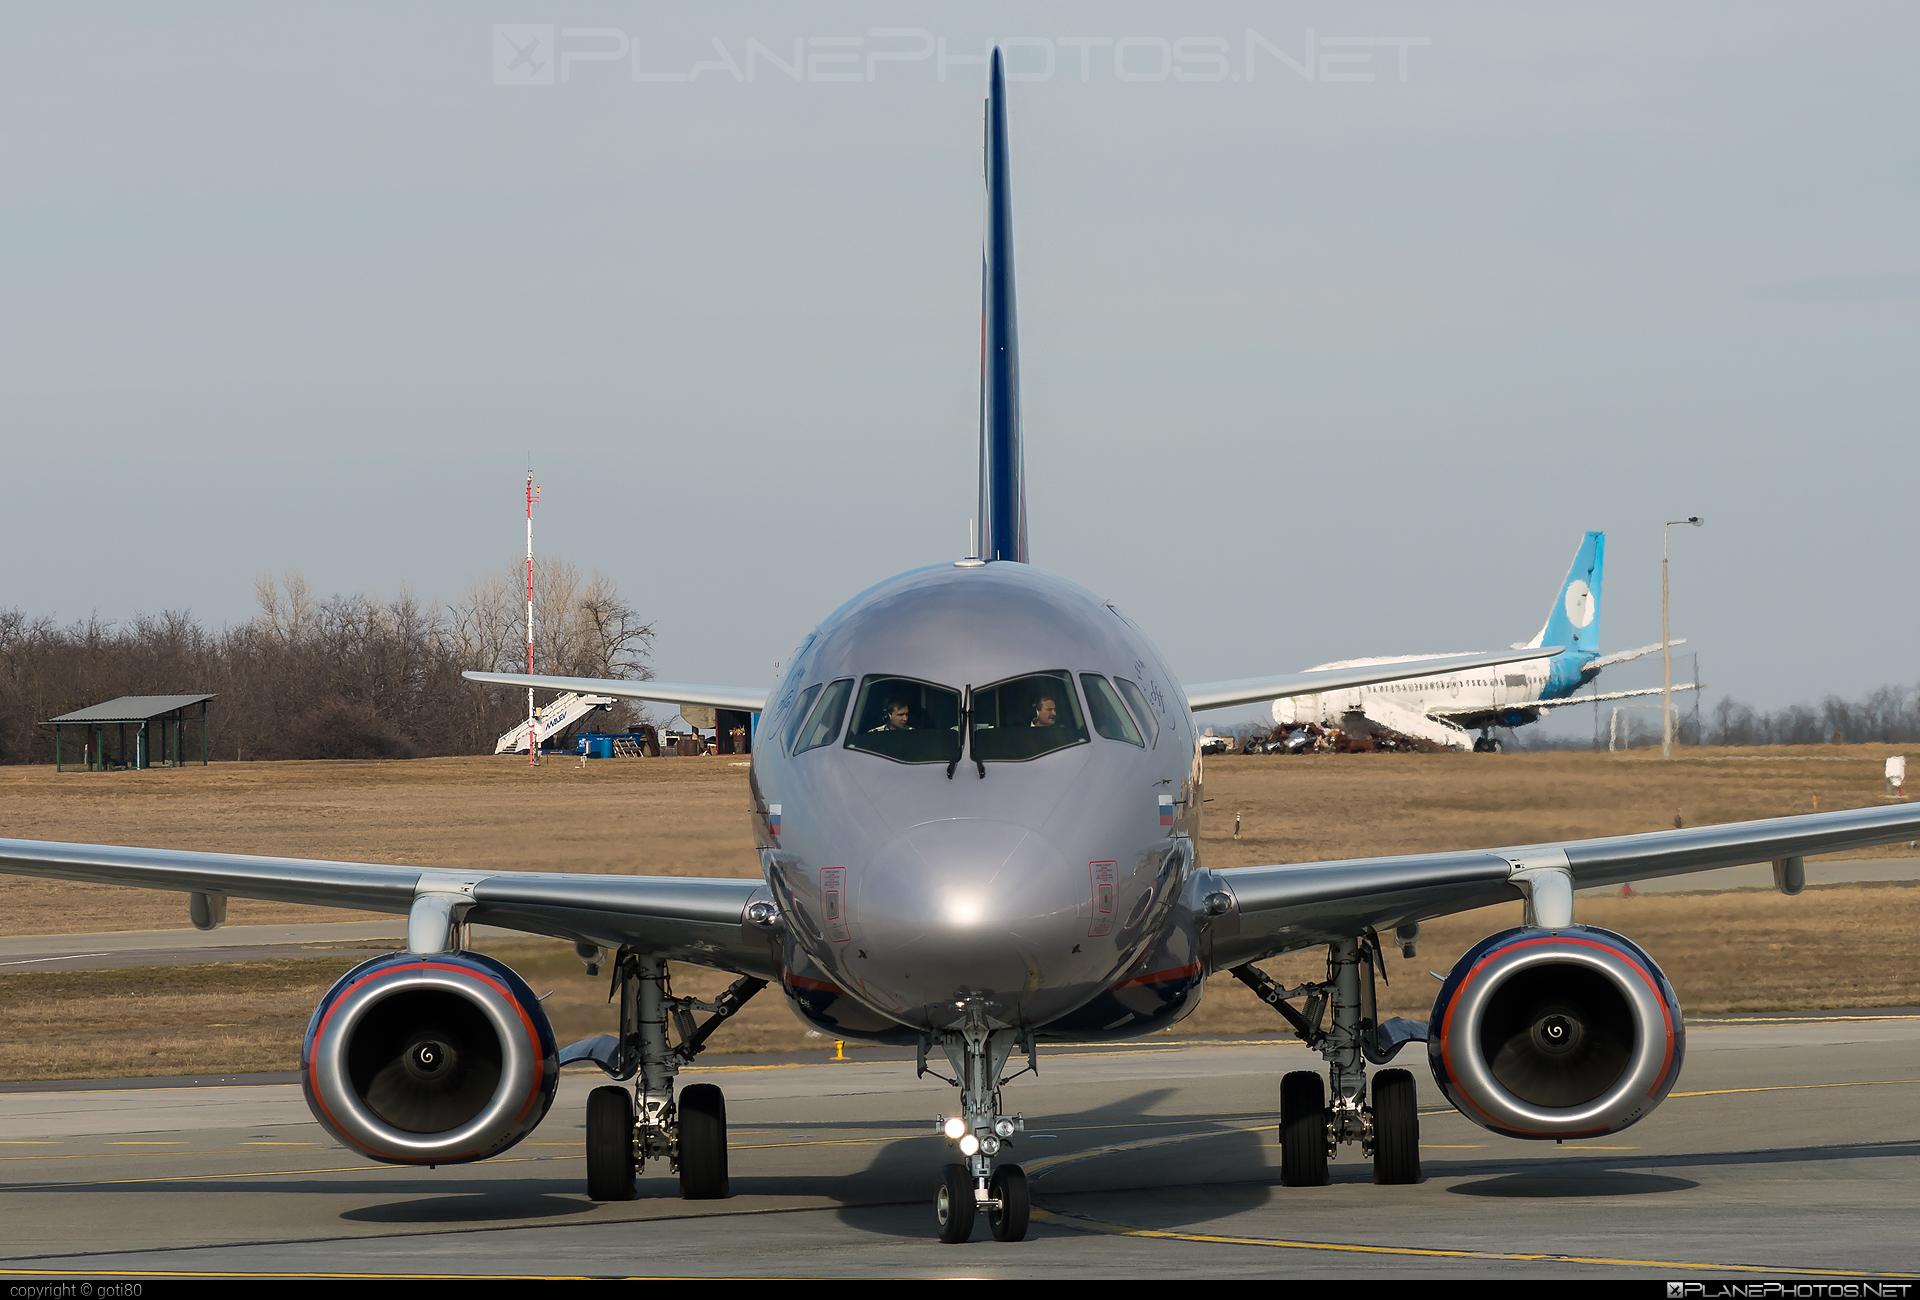 Sukhoi SSJ 100-95B Superjet - RA-89108 operated by Aeroflot #aeroflot #ssj100 #ssj10095b #sukhoi #sukhoisuperjet #superjet